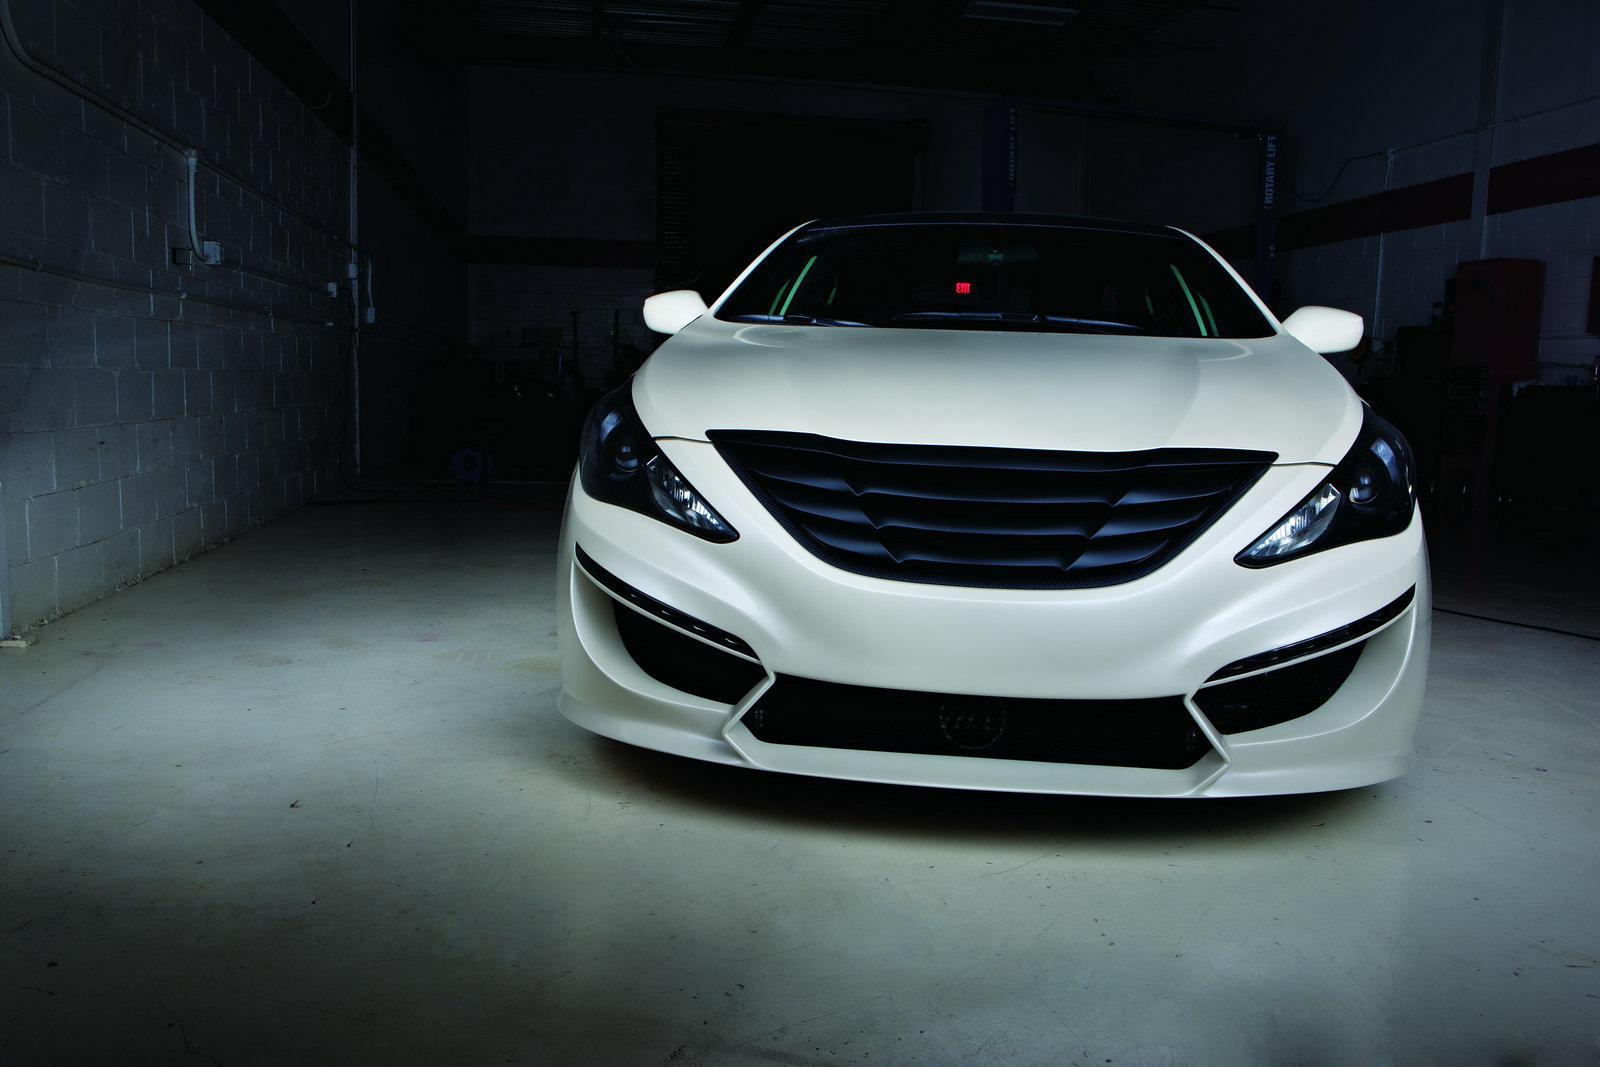 2010 Sema Custom Hyundai Sonata Turbo By Rides And 0 60 Magazines